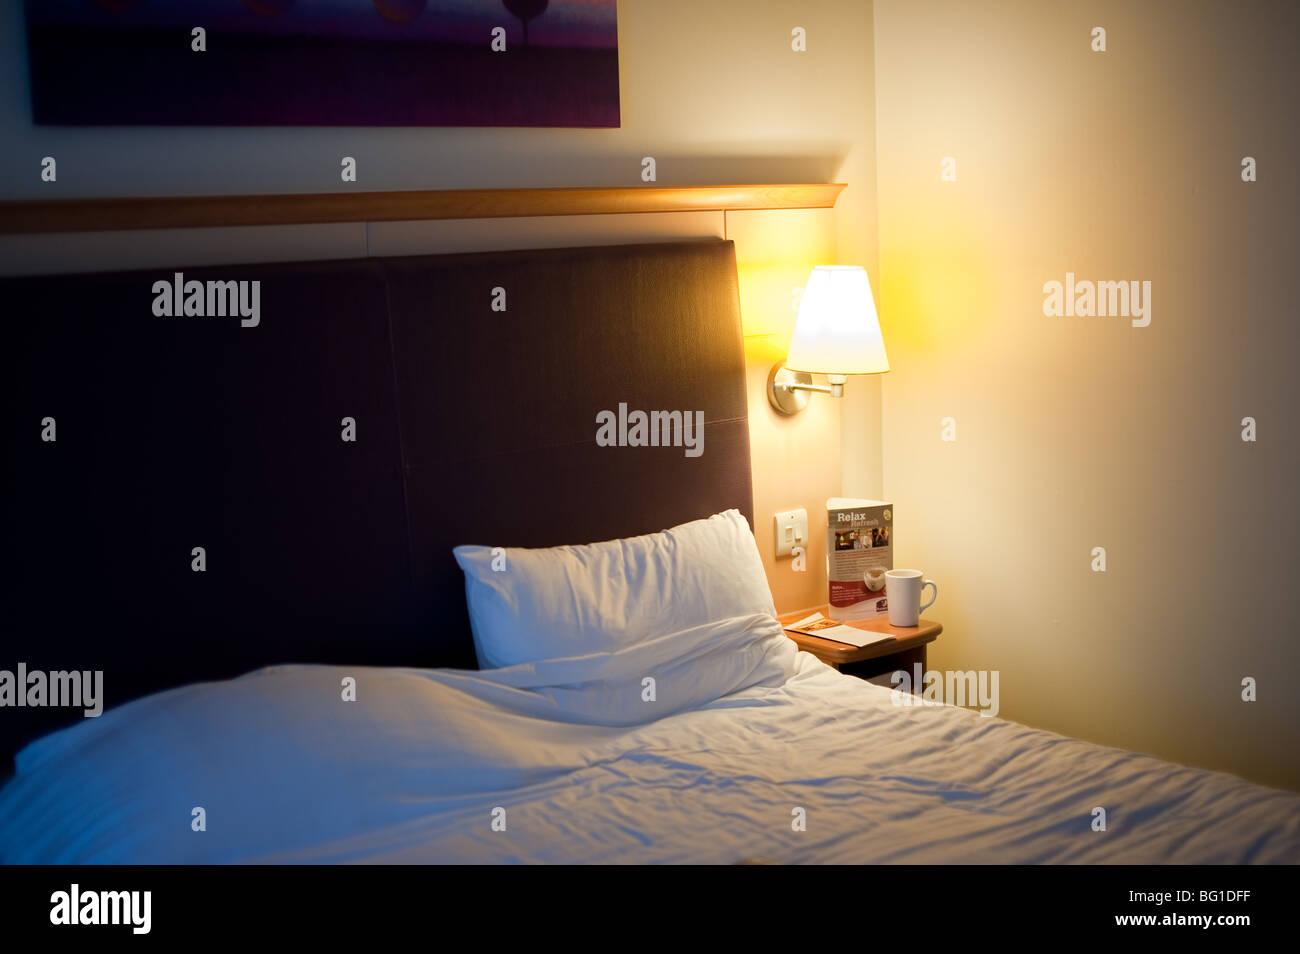 Hotel bedroom - Stock Image